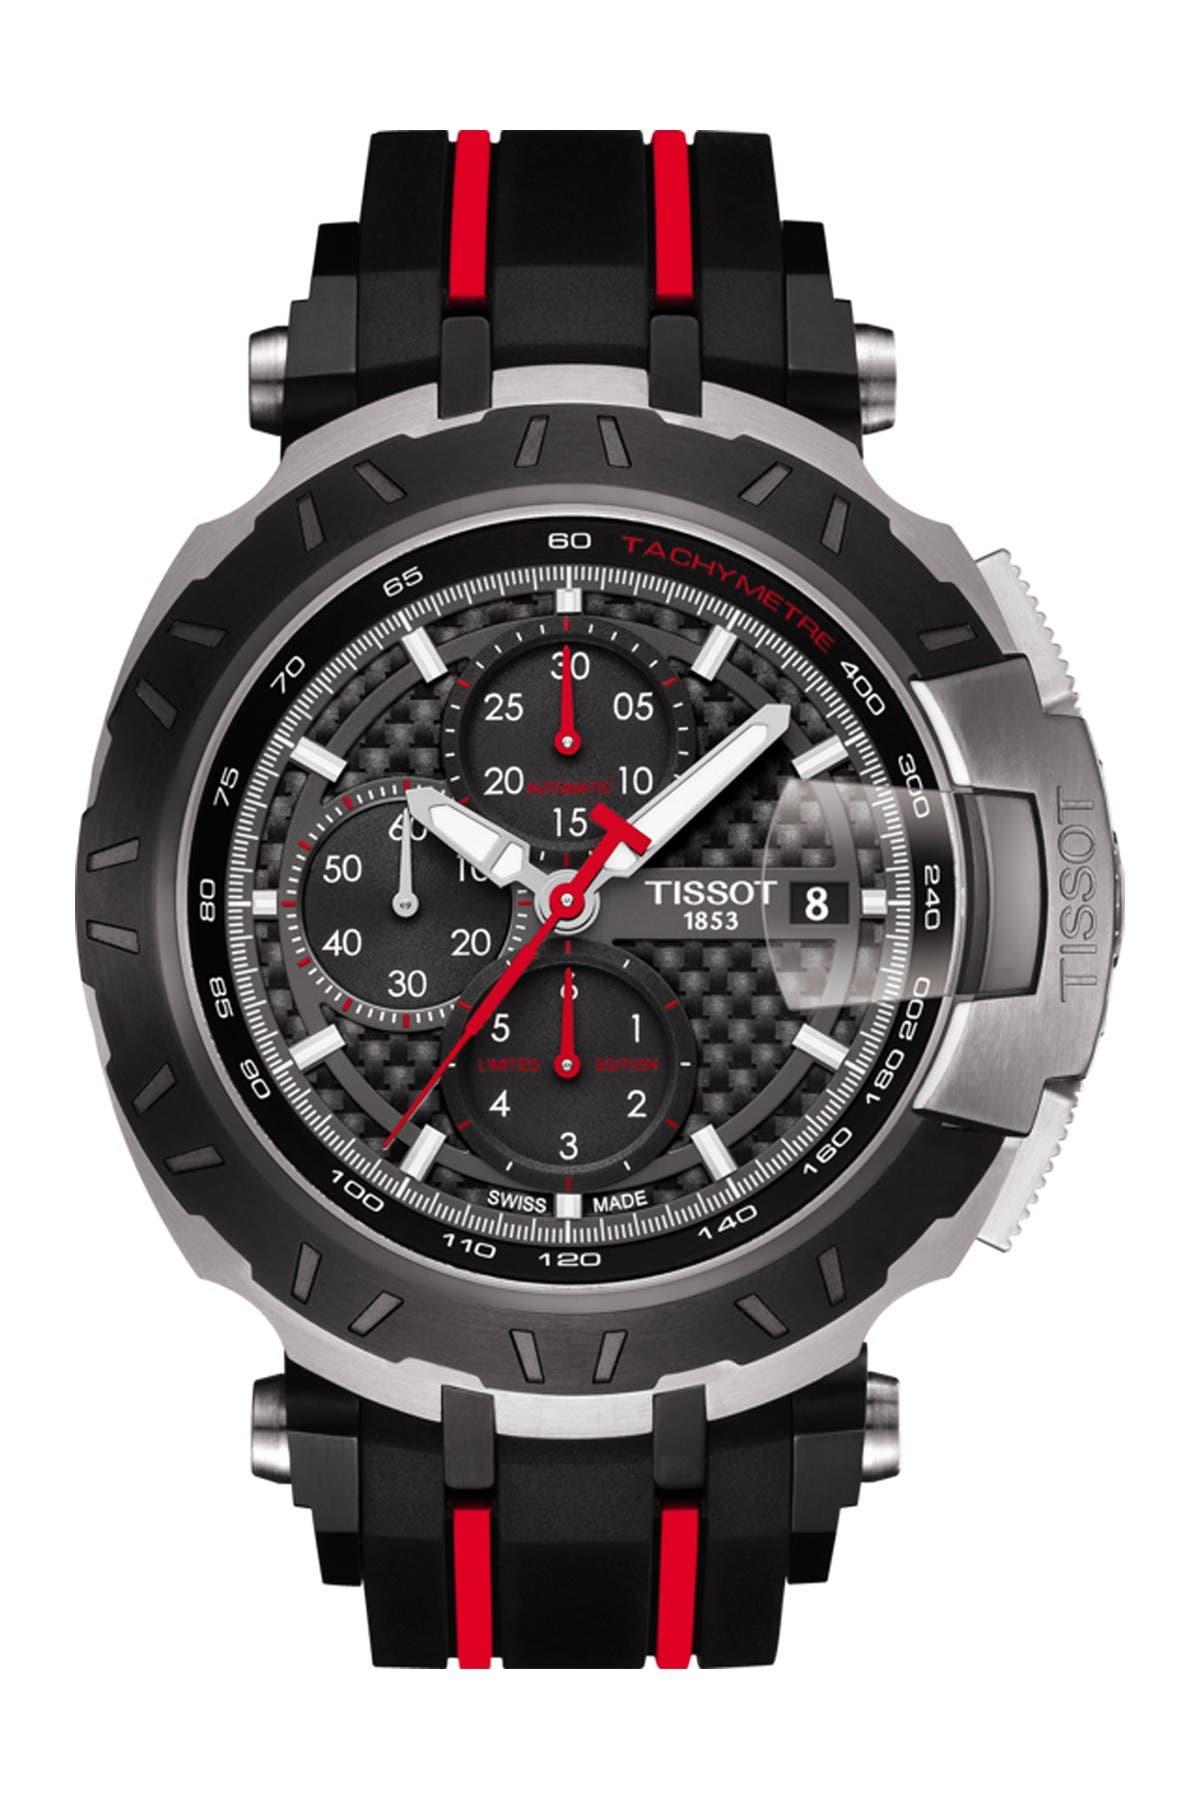 Image of Tissot Men's T-Race Moto GP 2016 Automatic Chronograph Watch, 47.25mm